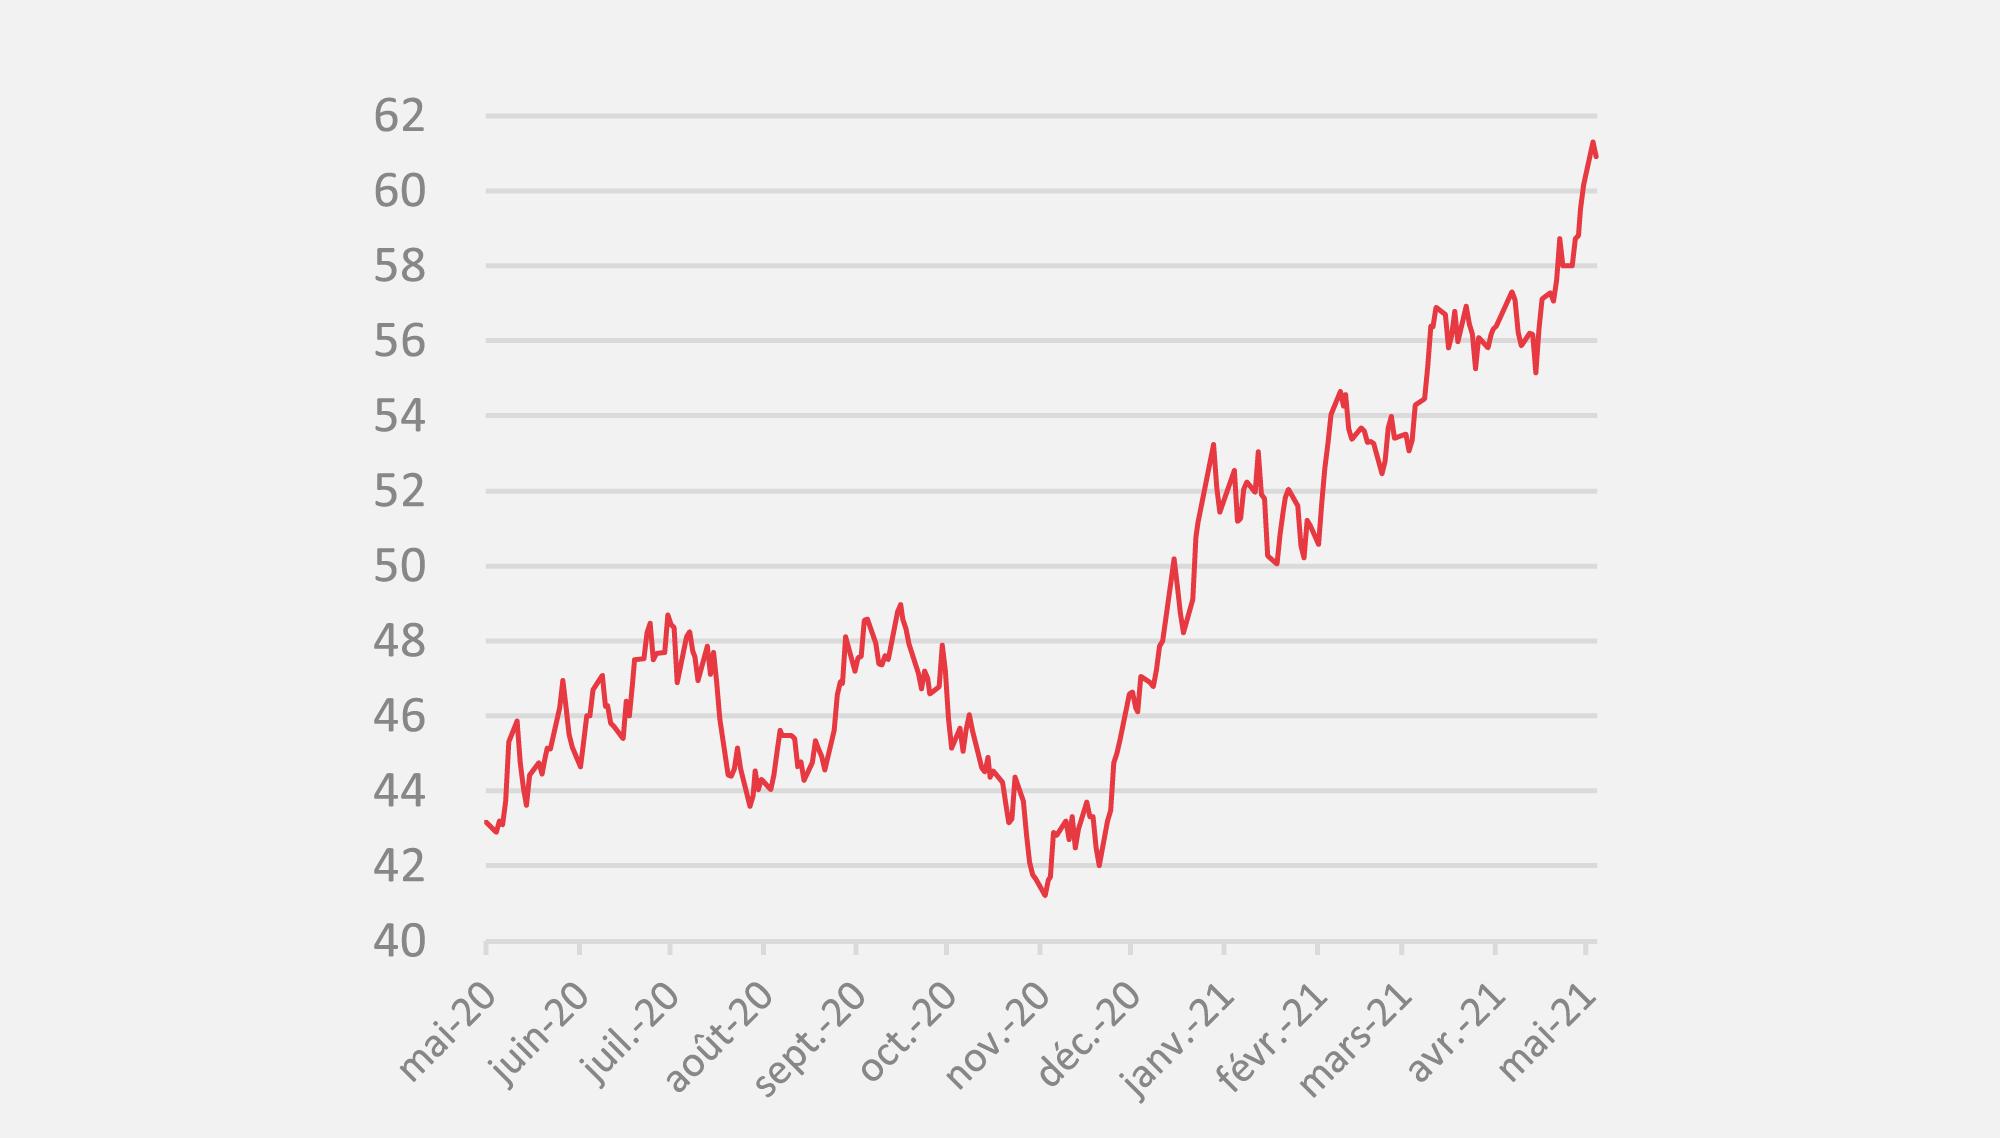 opera energie evolution du prix electricite depuis 1 an en date de mai 2021